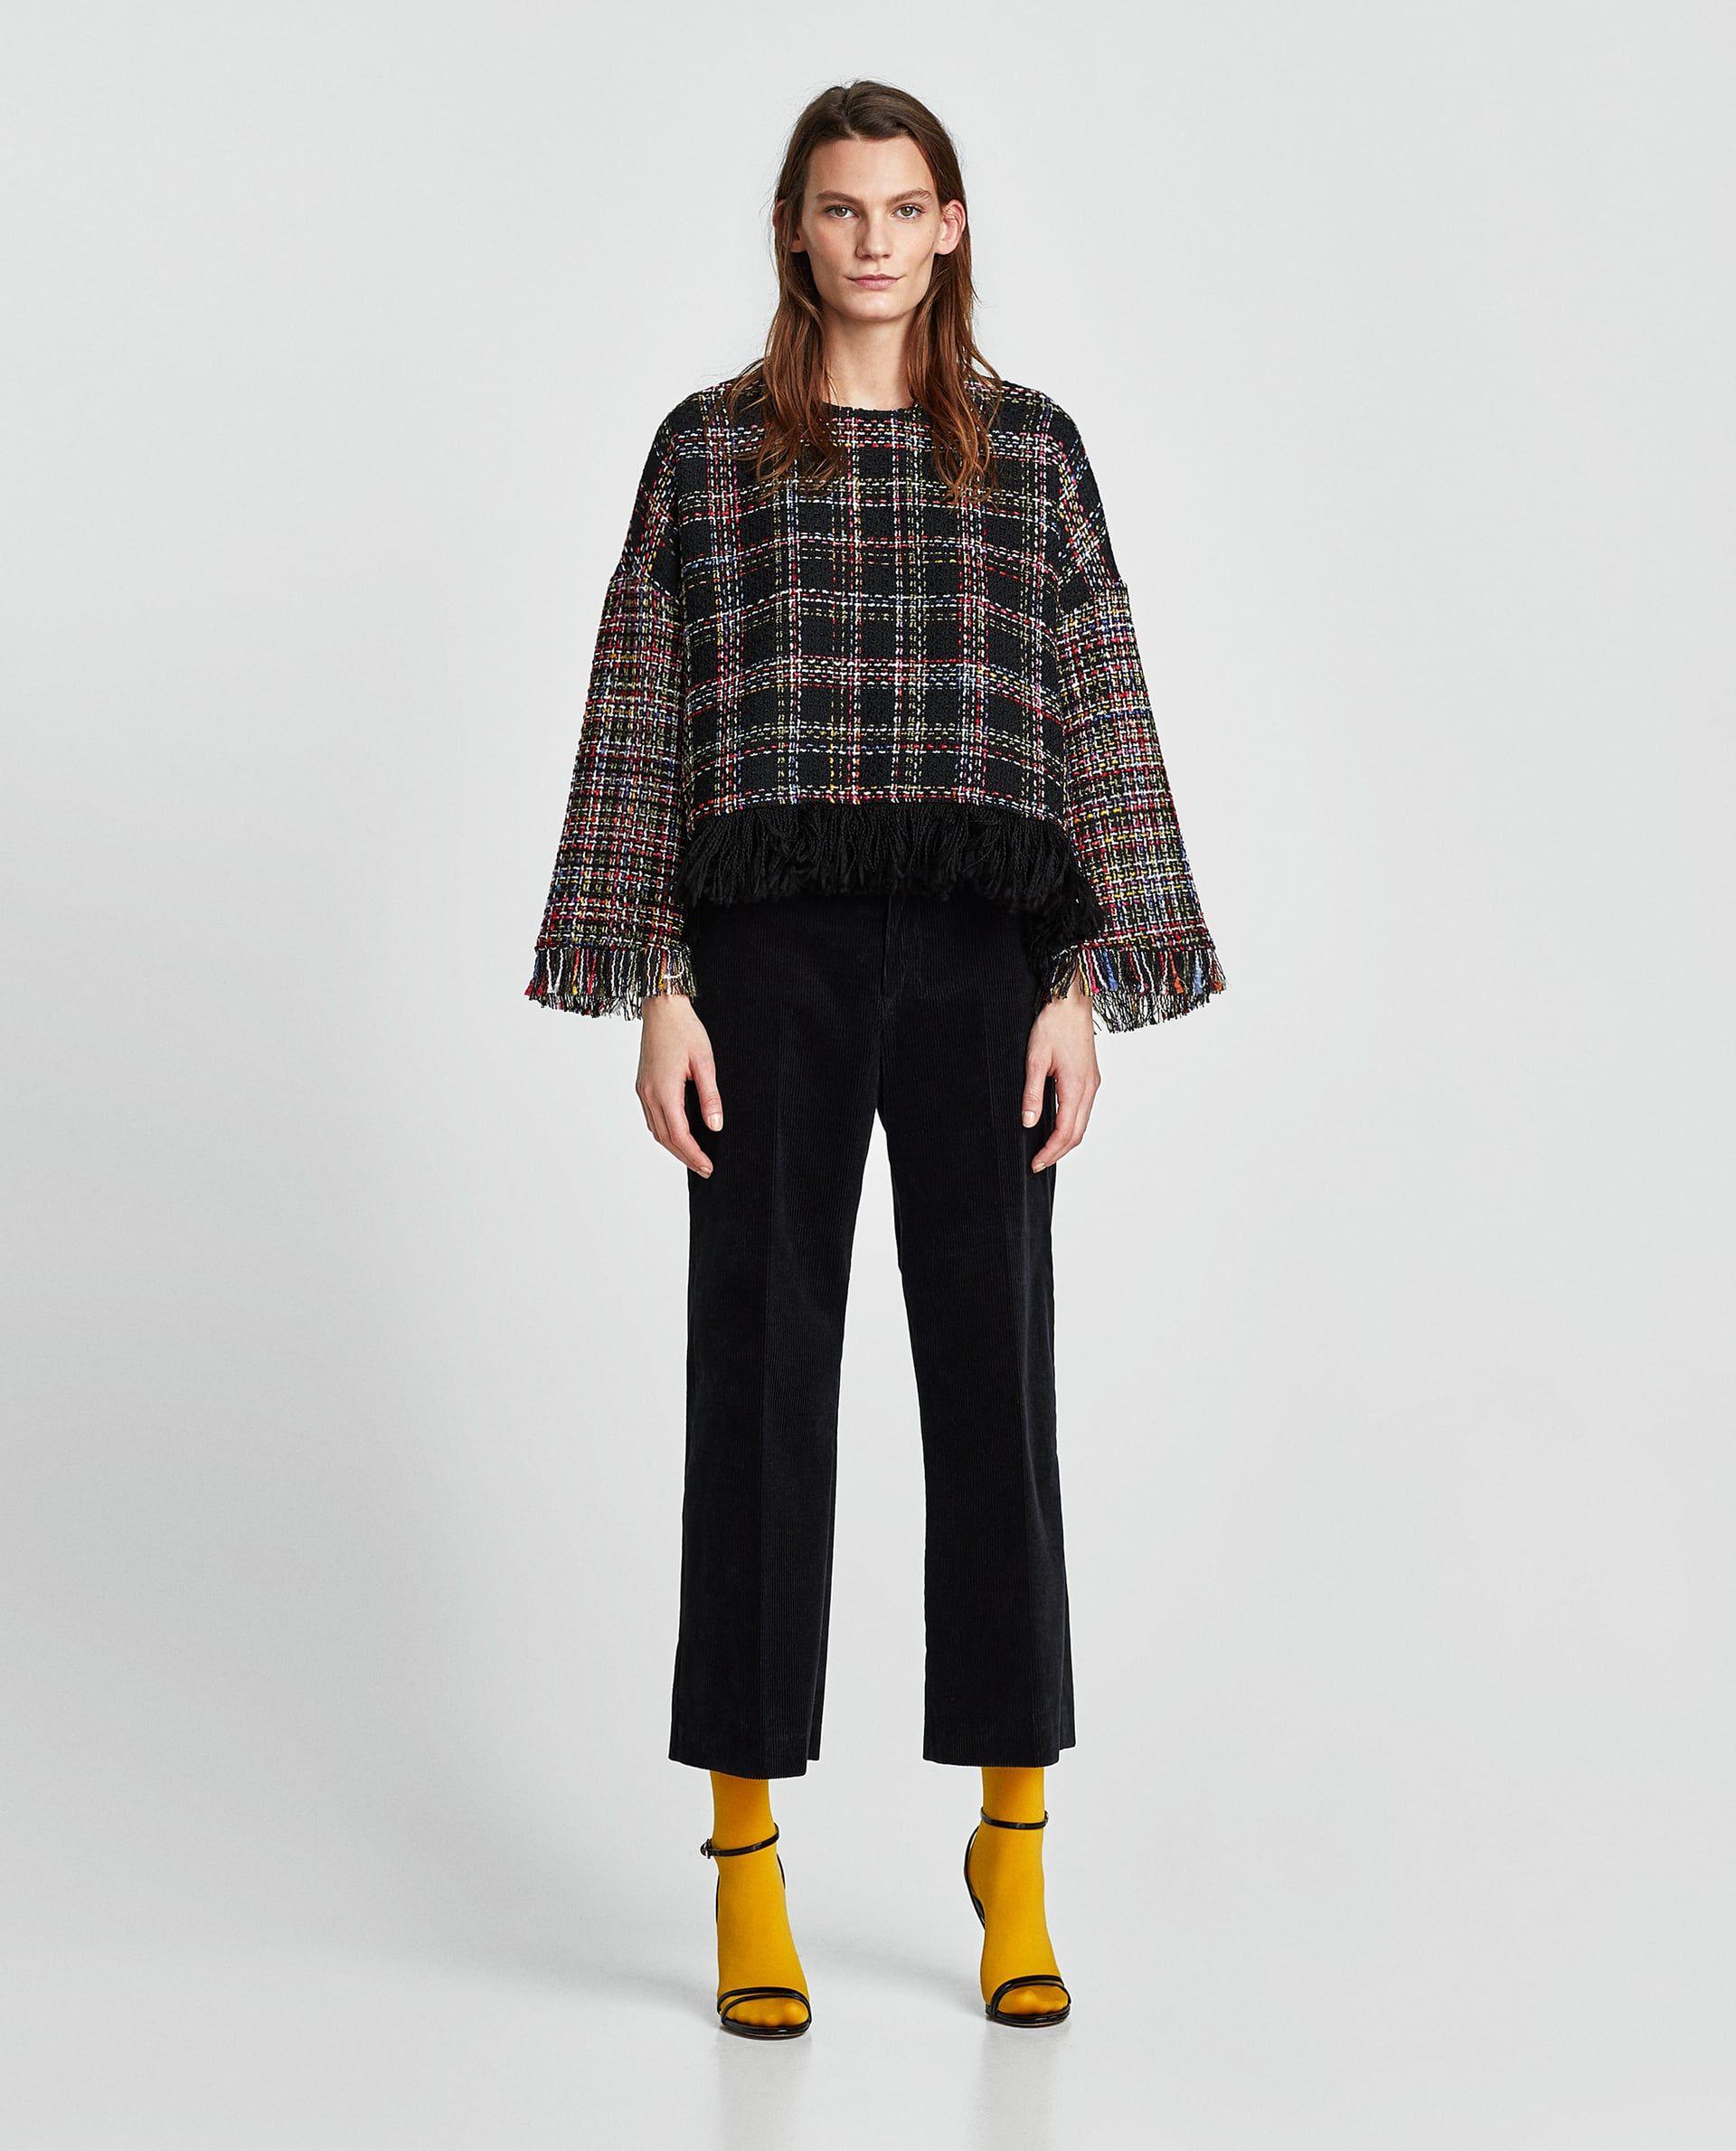 2262e8c1e03b32 FRINGED TWEED TOP | my style | Shirt blouses, Shirts, Blouse